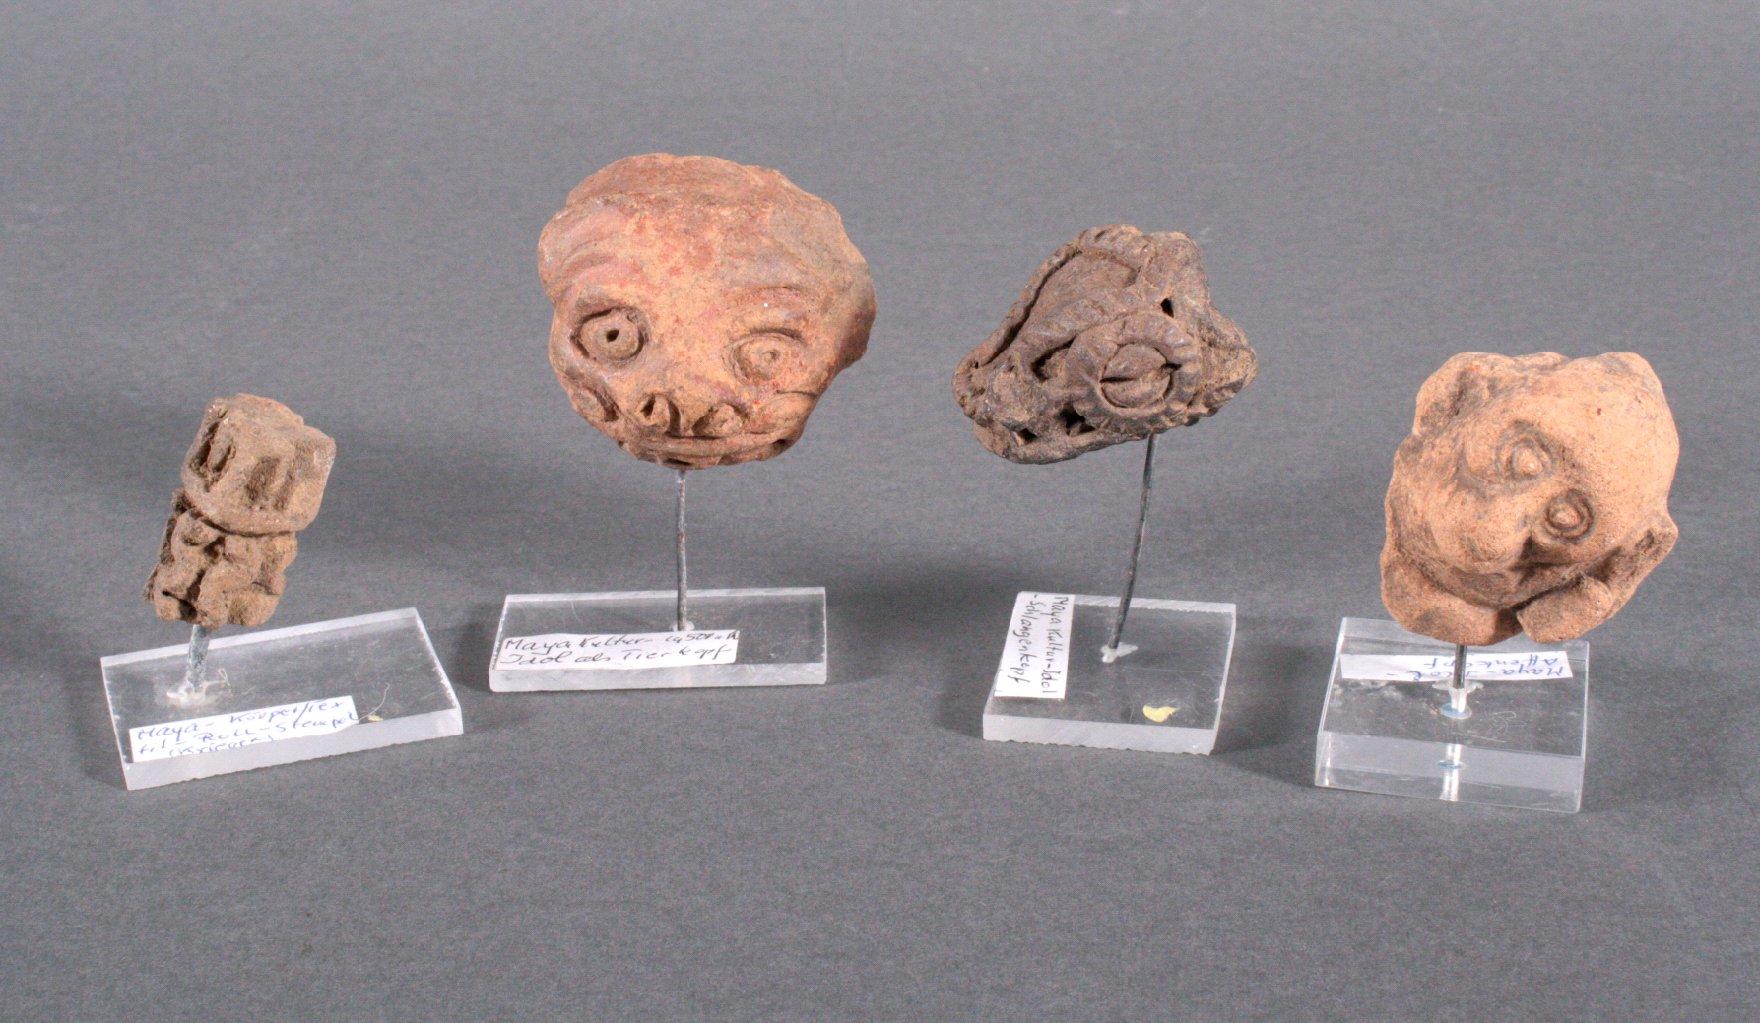 4 Teile der Mayakultur